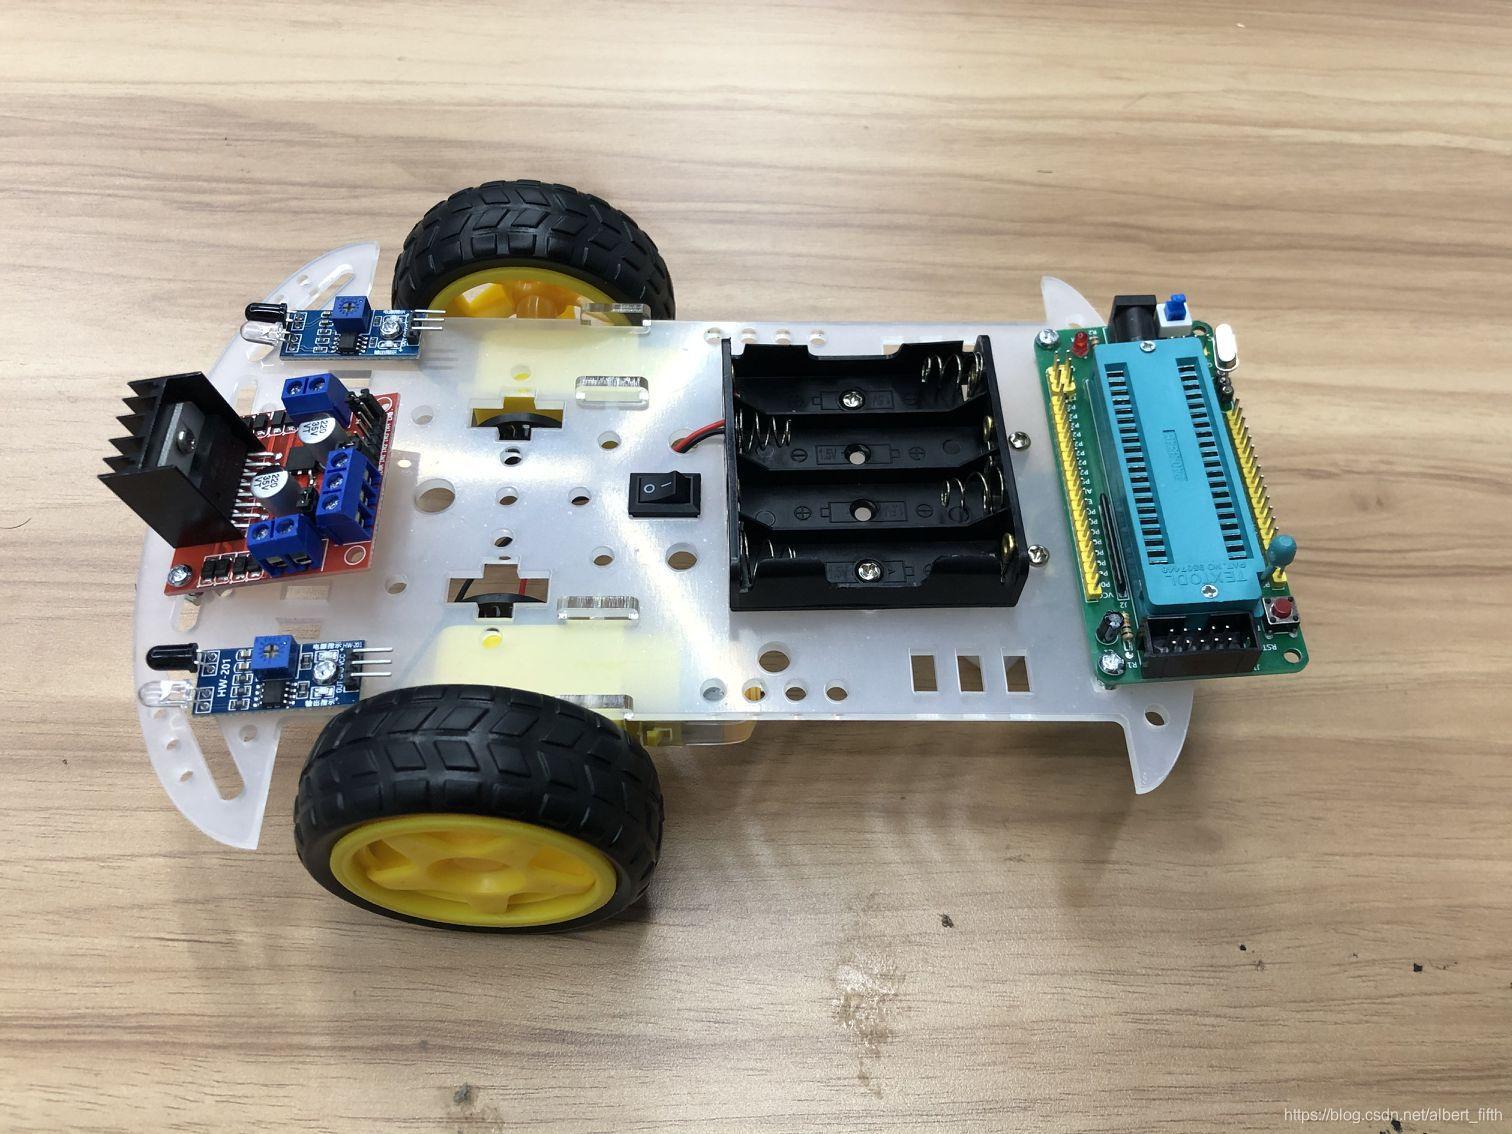 DIY一个红外避障小车!(1)硬件部分的安装